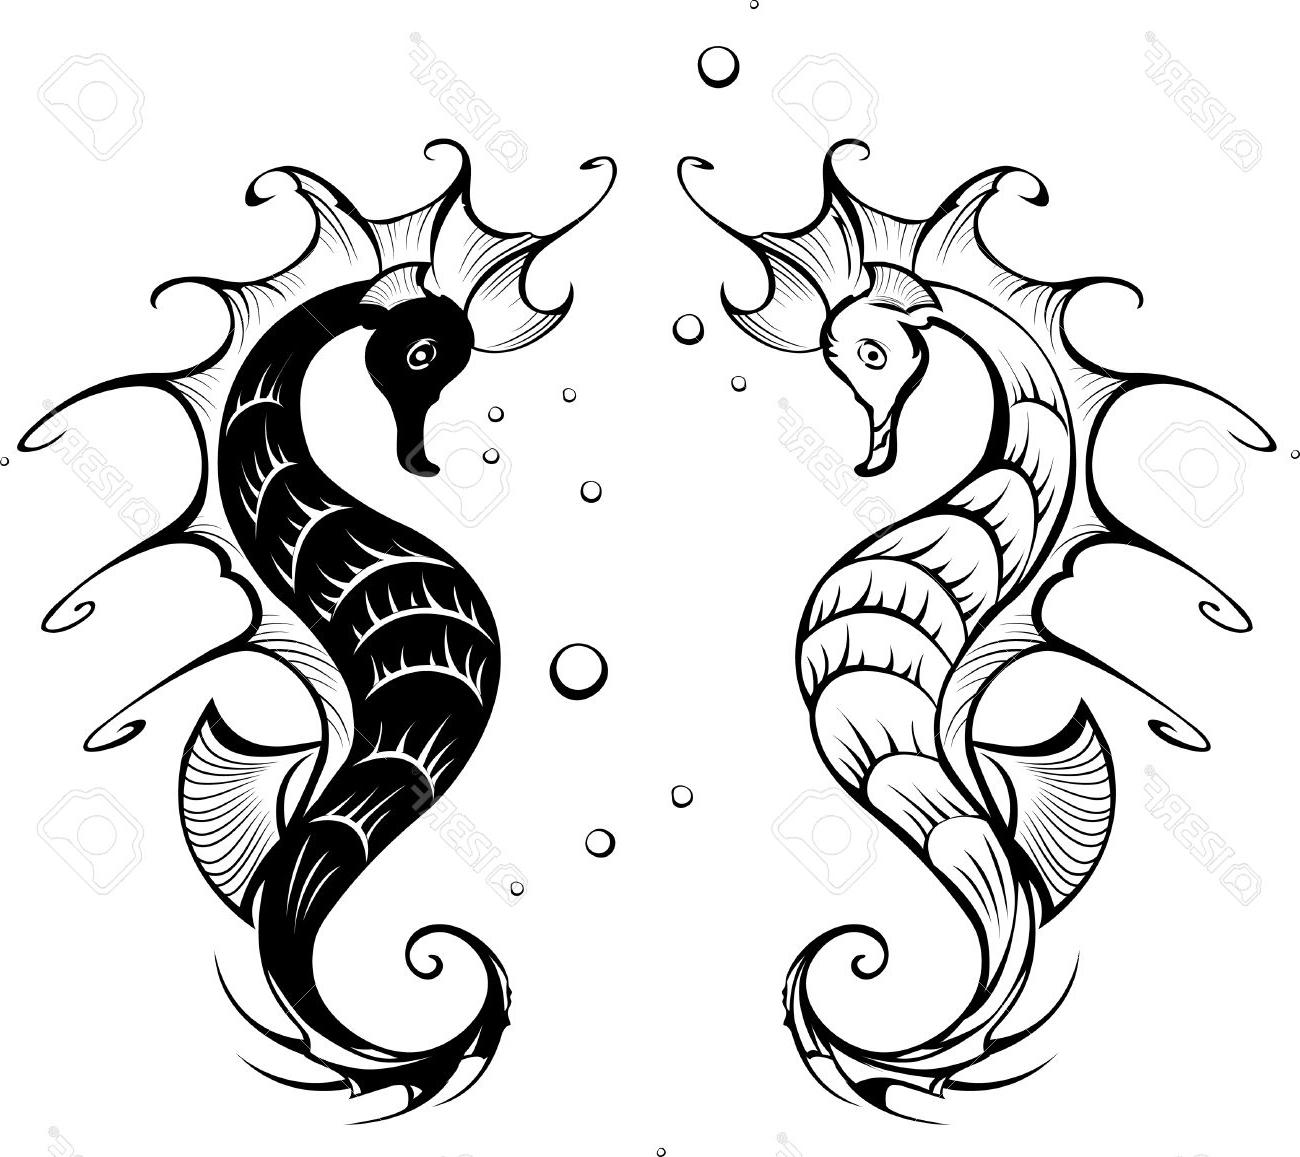 Seahorse Cartoon Drawing at GetDrawings | Free download